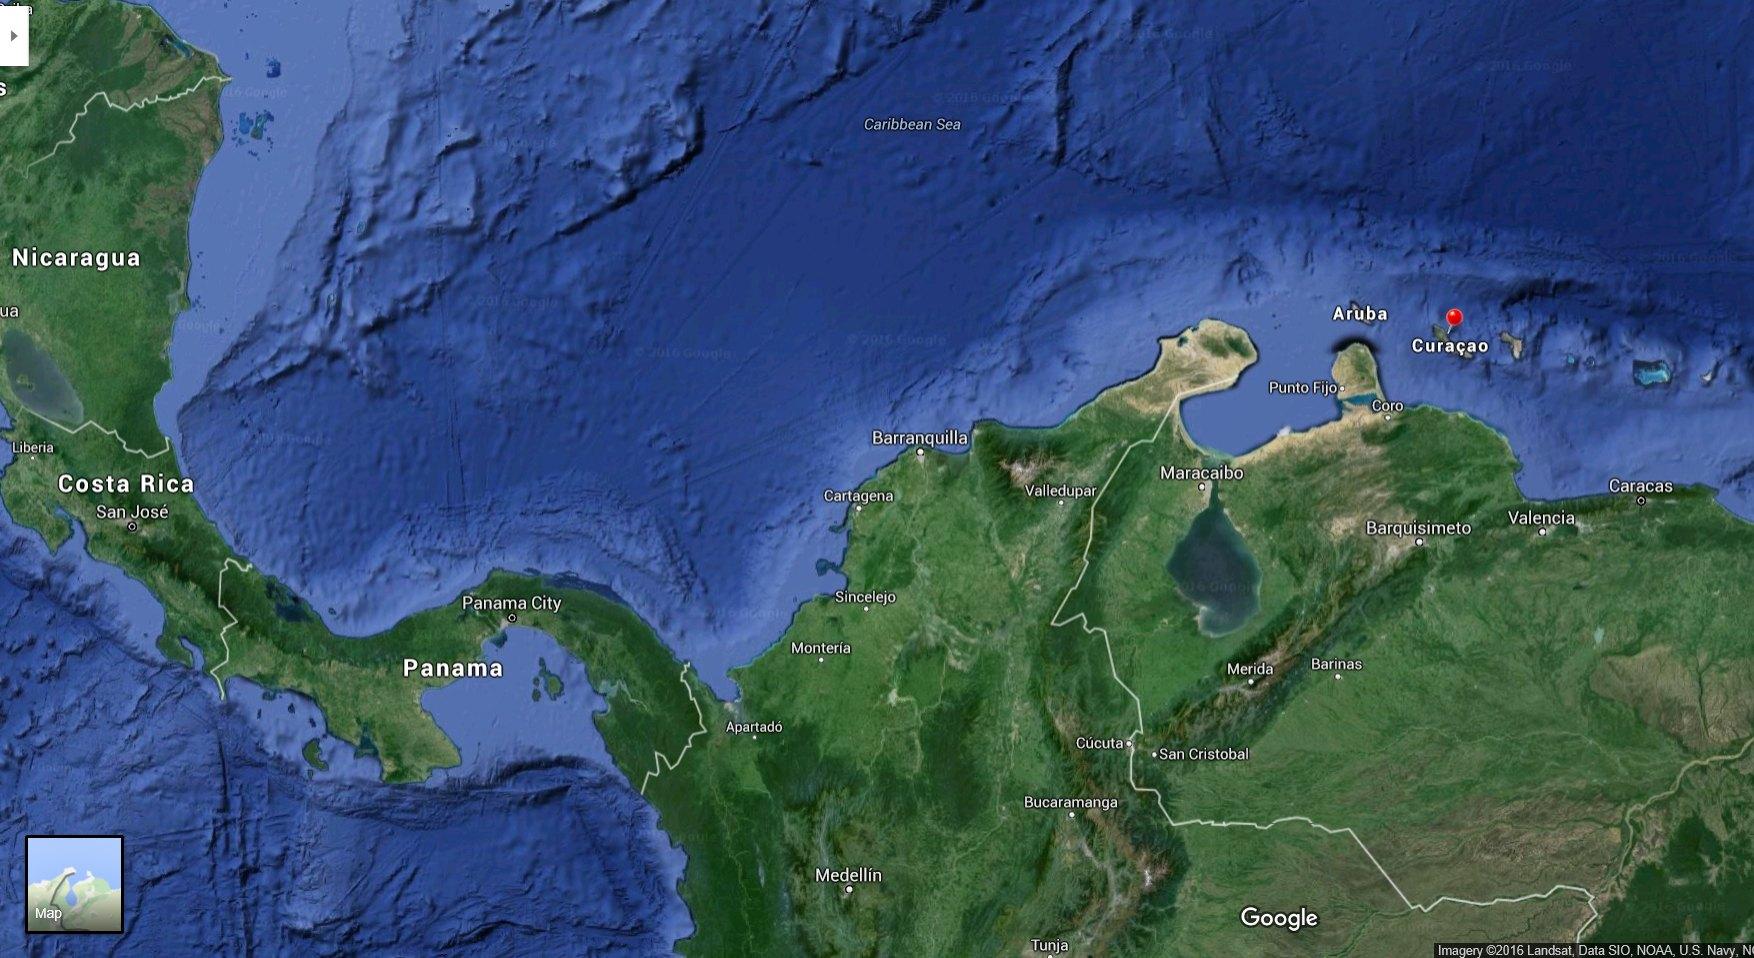 Where is Curacao?